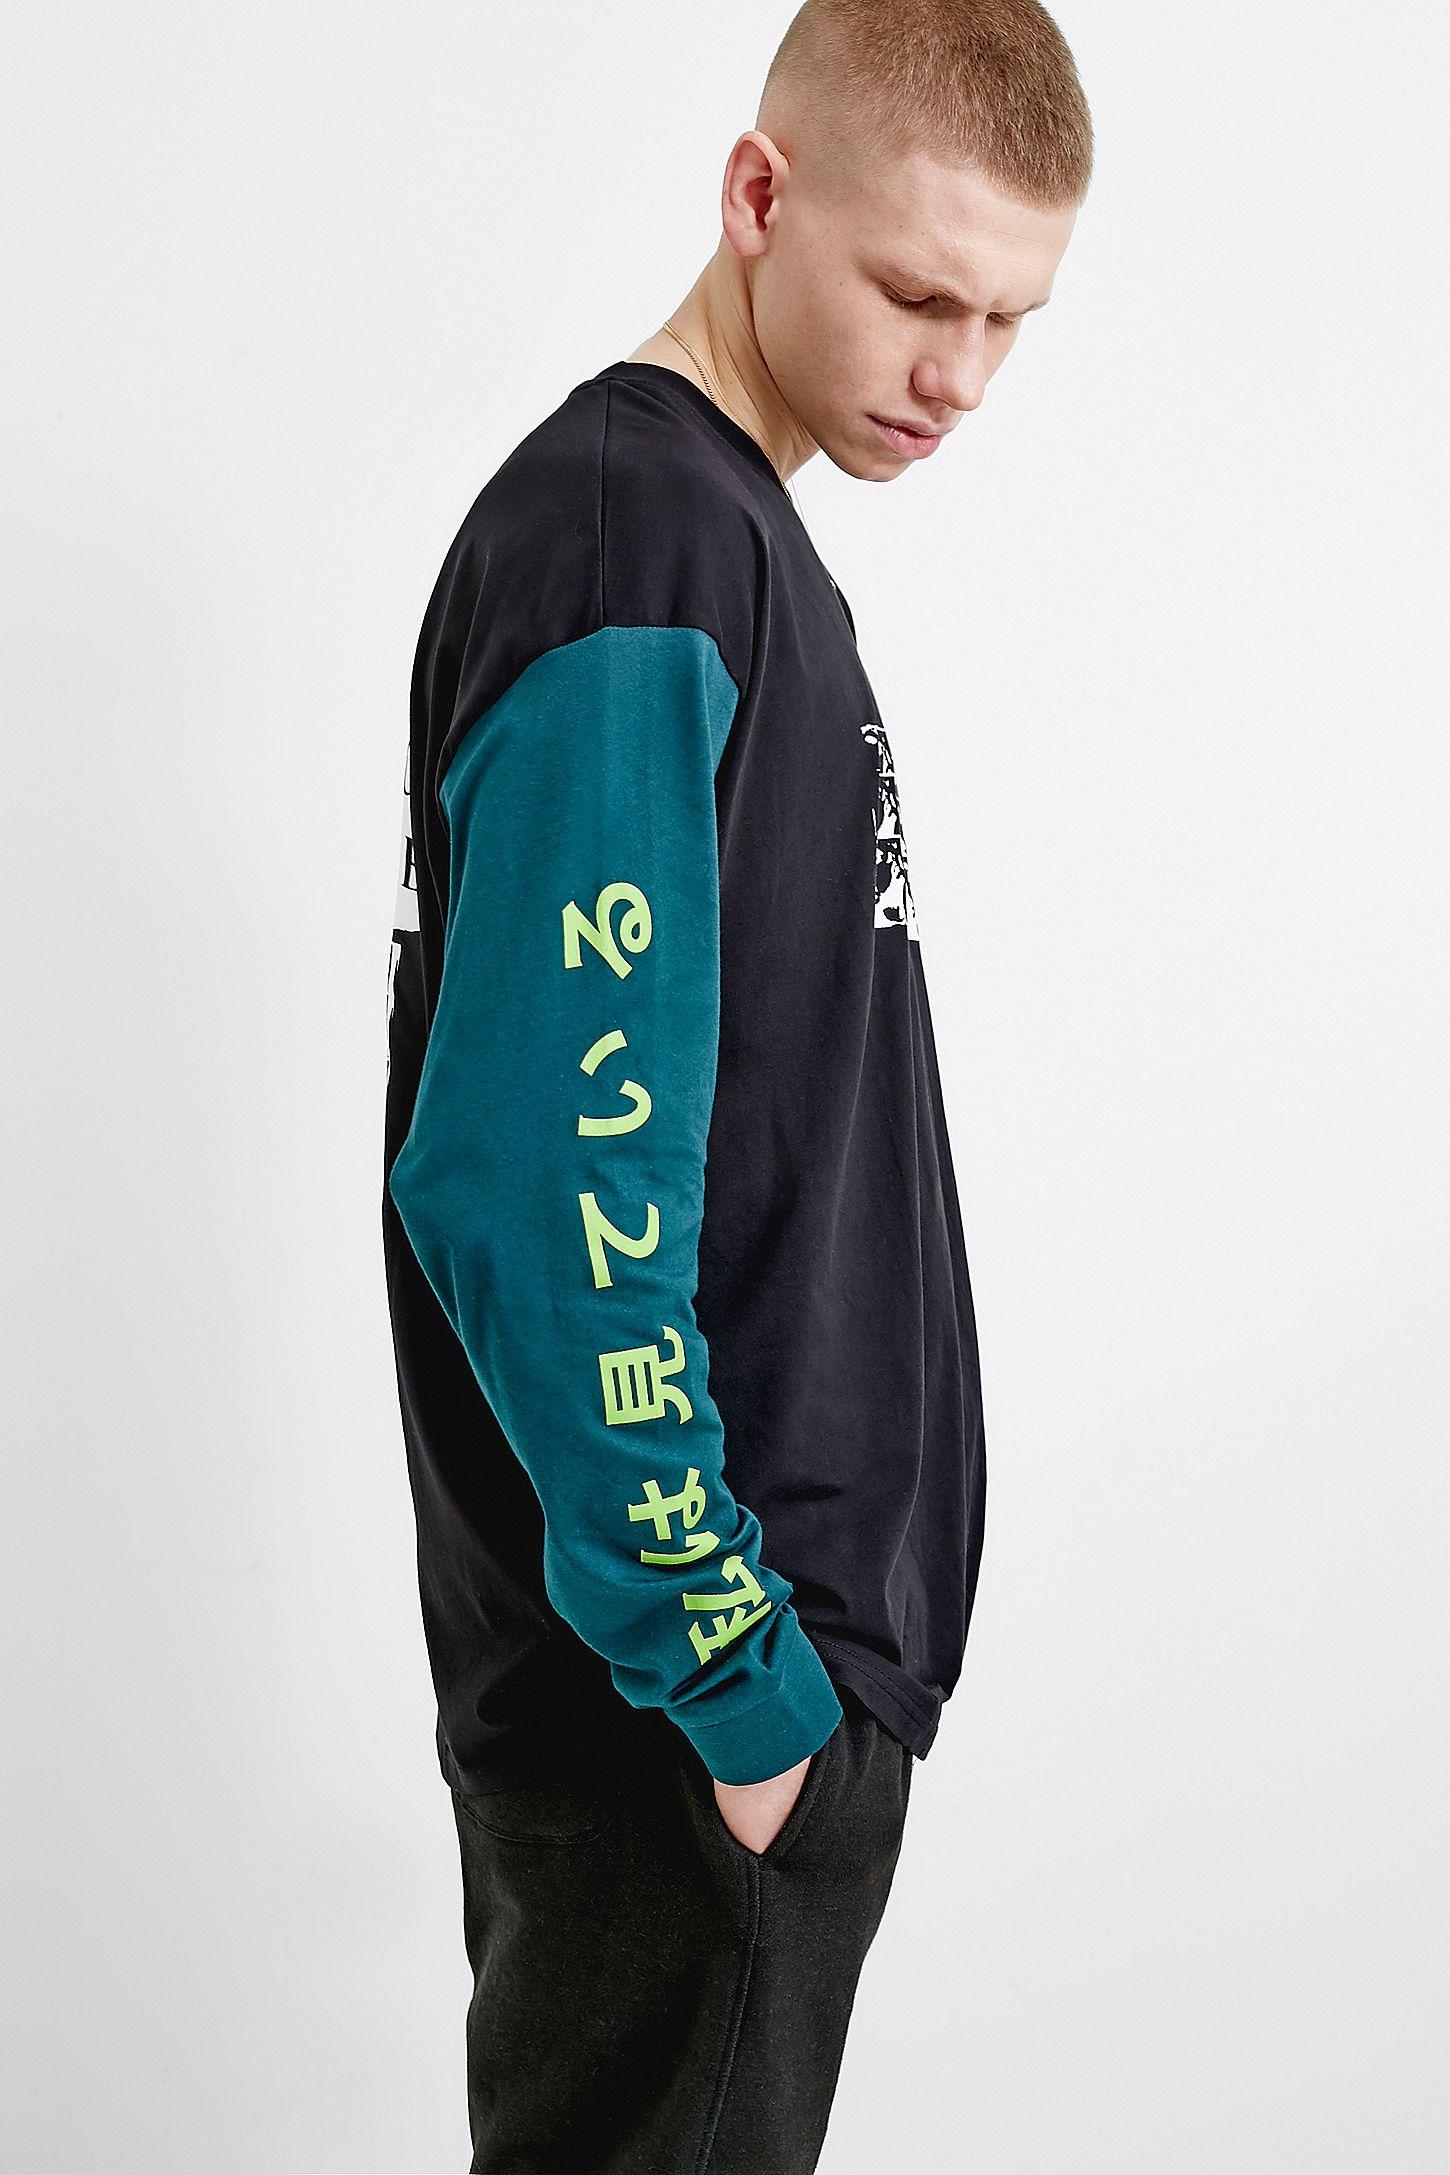 fbc609a04e62ed UO Cut and Sew Allover Skate Print Long-Sleeve T-Shirt | Urban ...